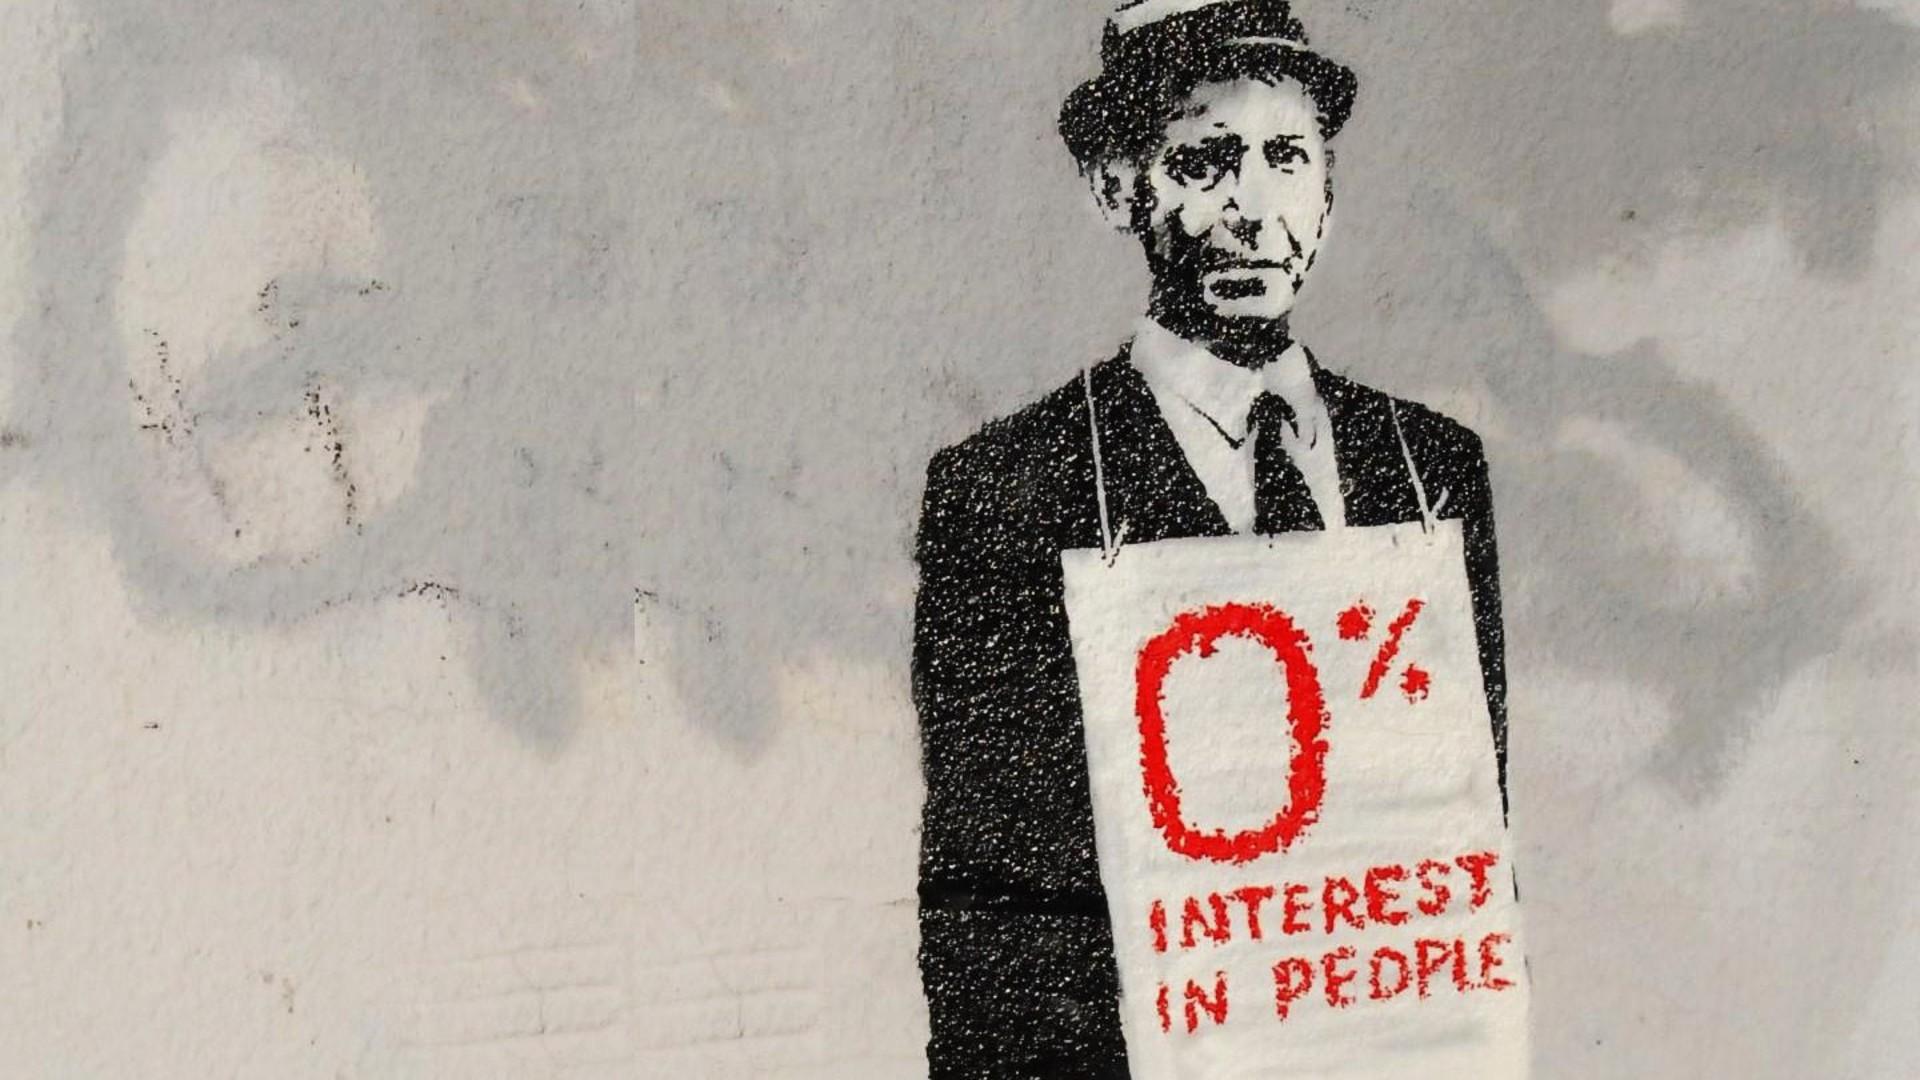 Banksy Wallpaper 1920x1080 73 Images